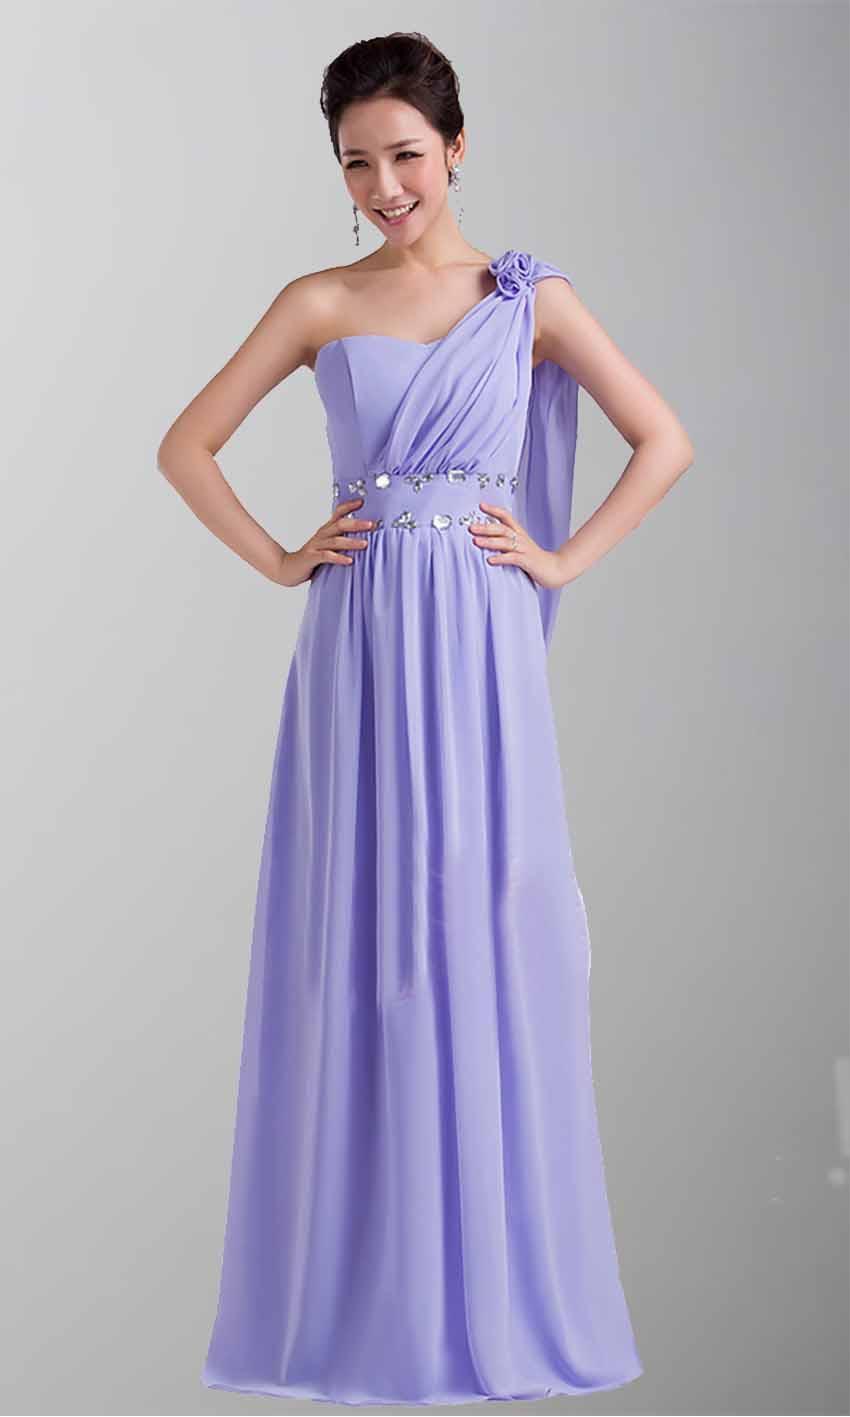 Luxury wedding dress trends: Where to buy inexpensive bridesmaid ...